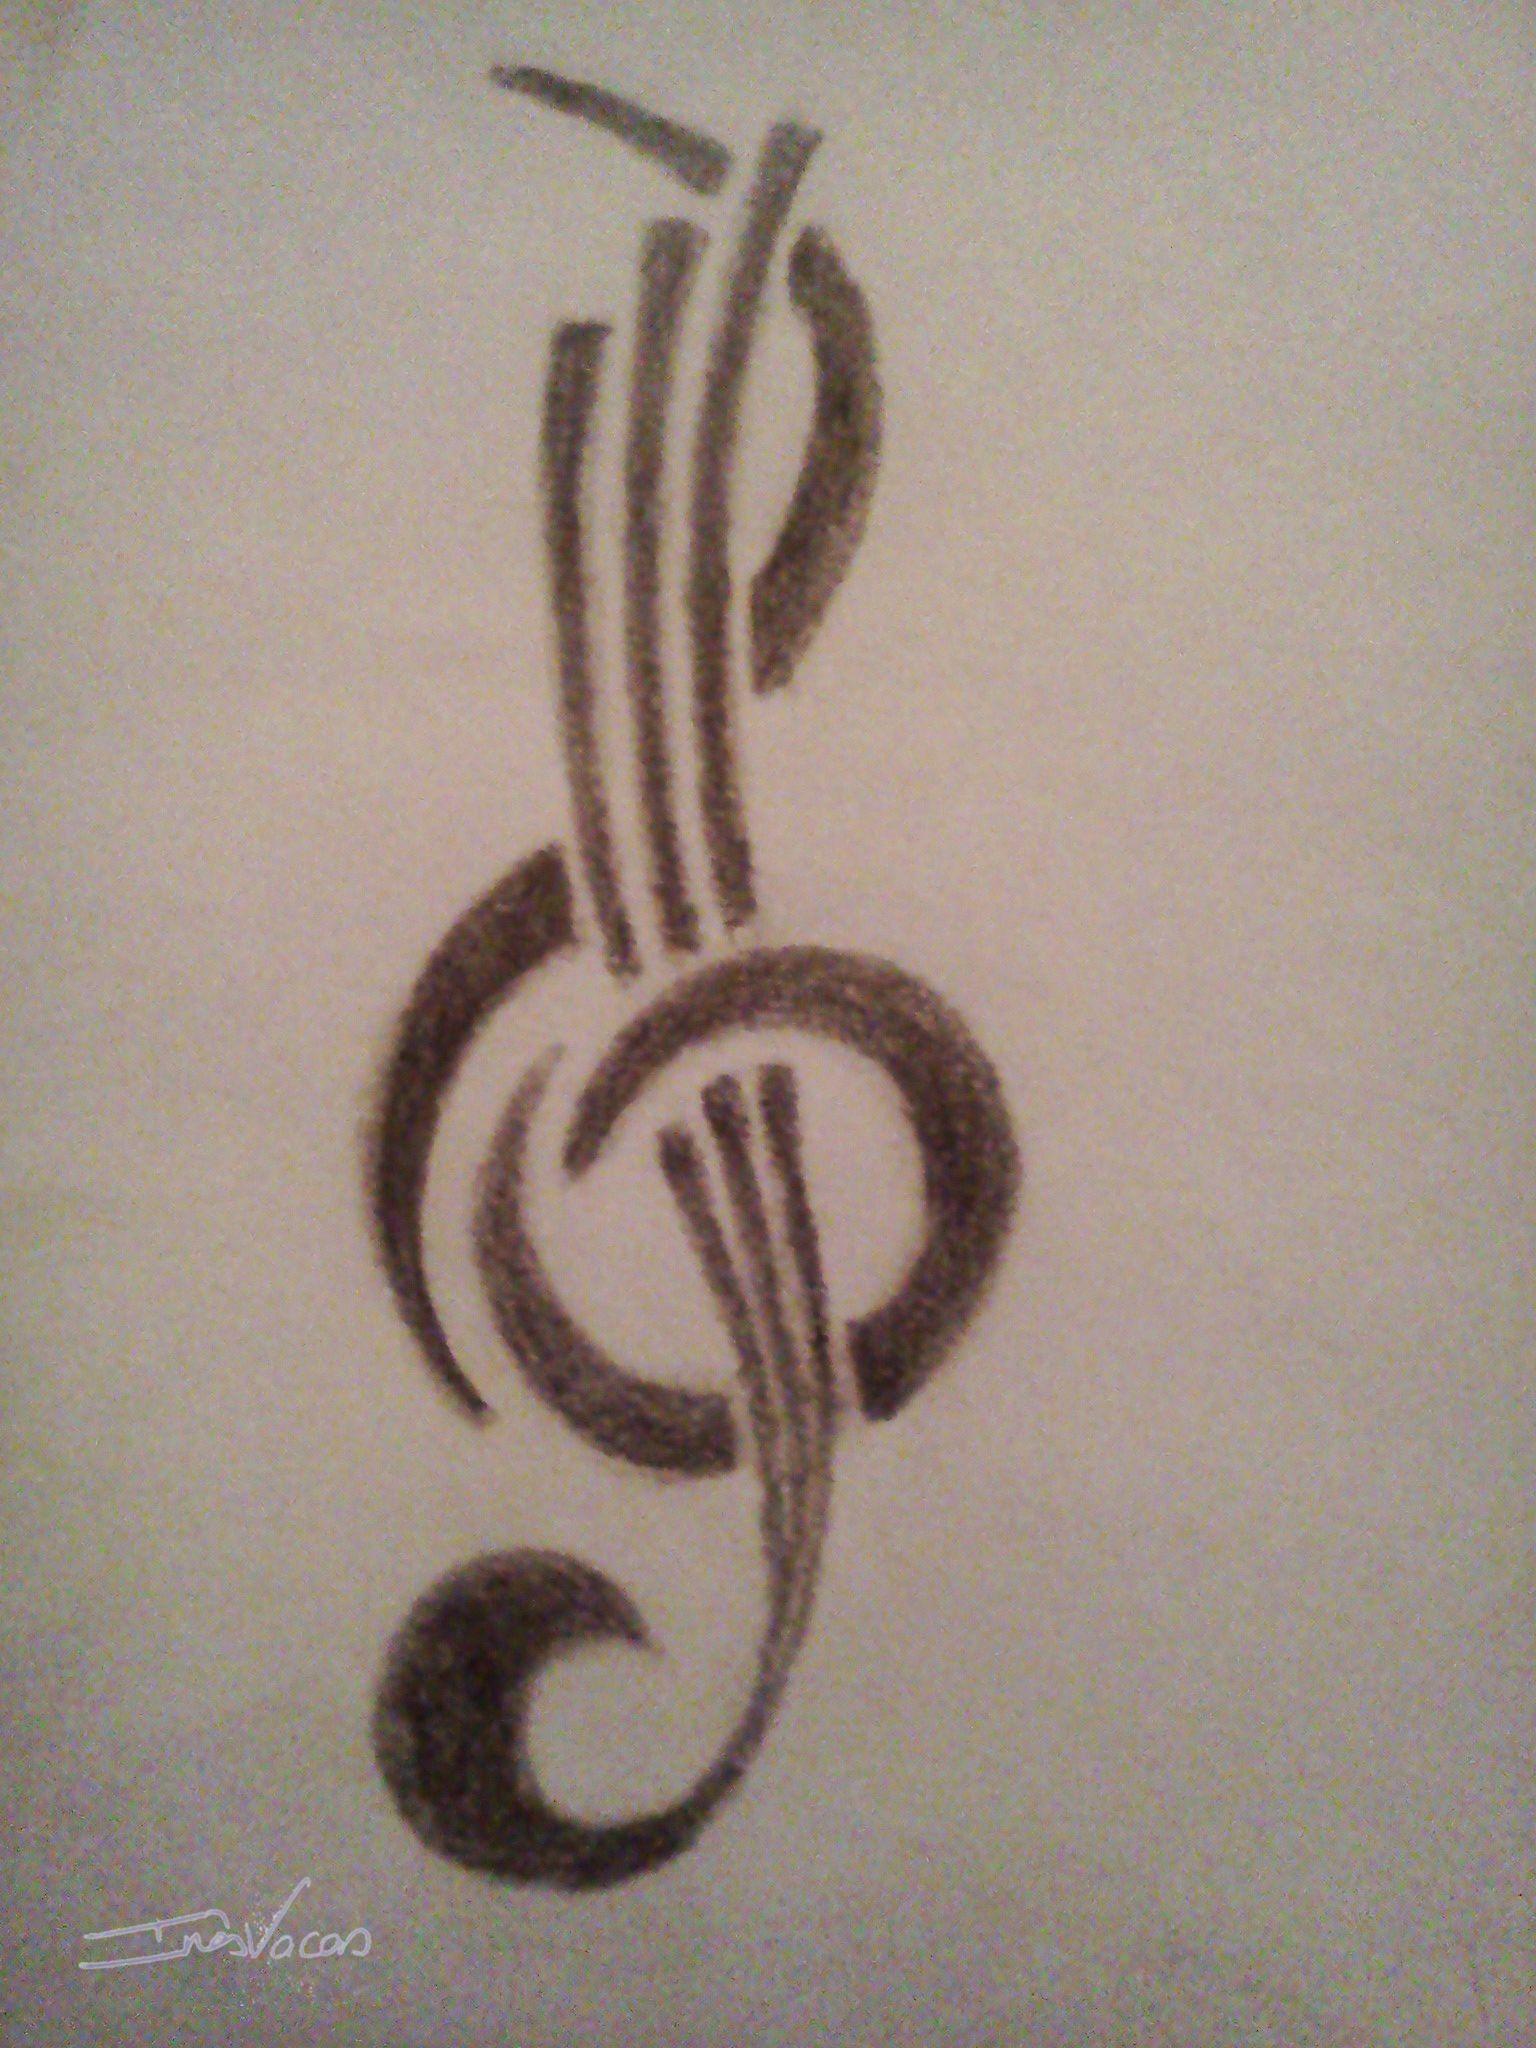 treble clef design tattoo clave de sol tatuaje pinterest treble clef design tattoo clave de sol mother son tattoostattoo symbolsdesign biocorpaavc